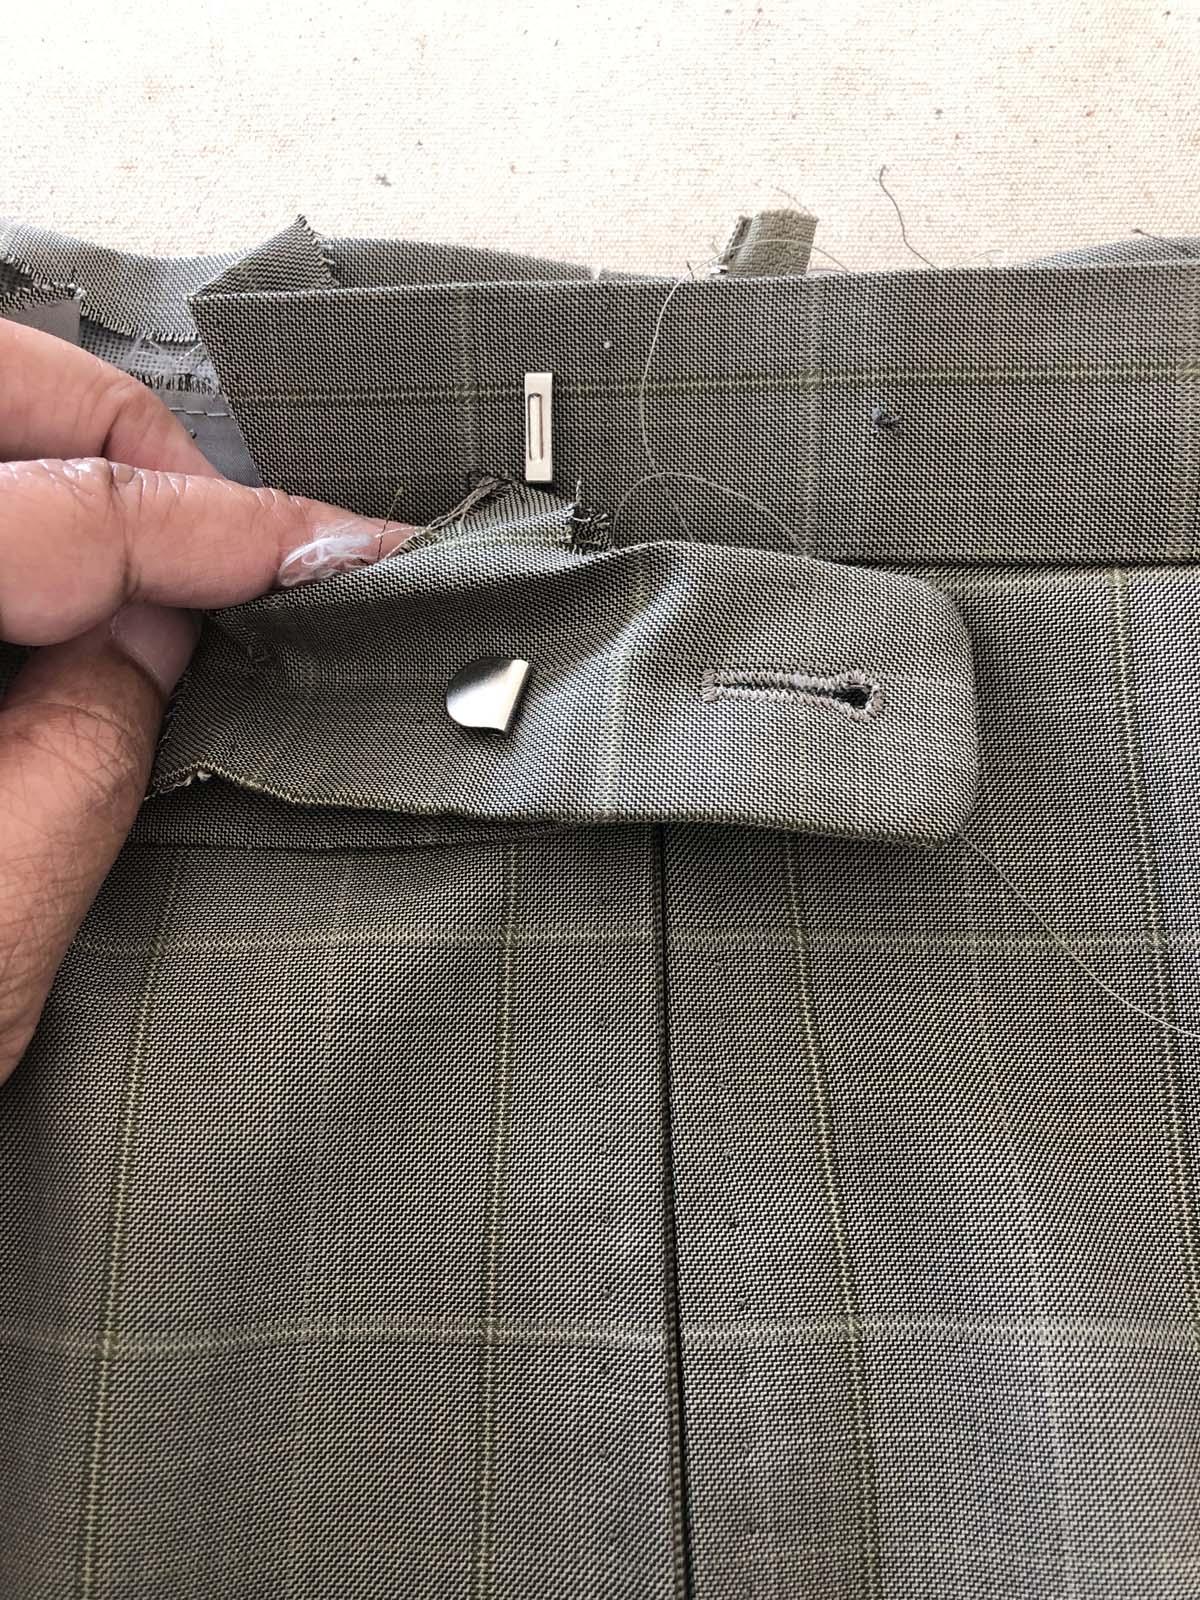 Close-up of men's suit pants waistband back with original closure